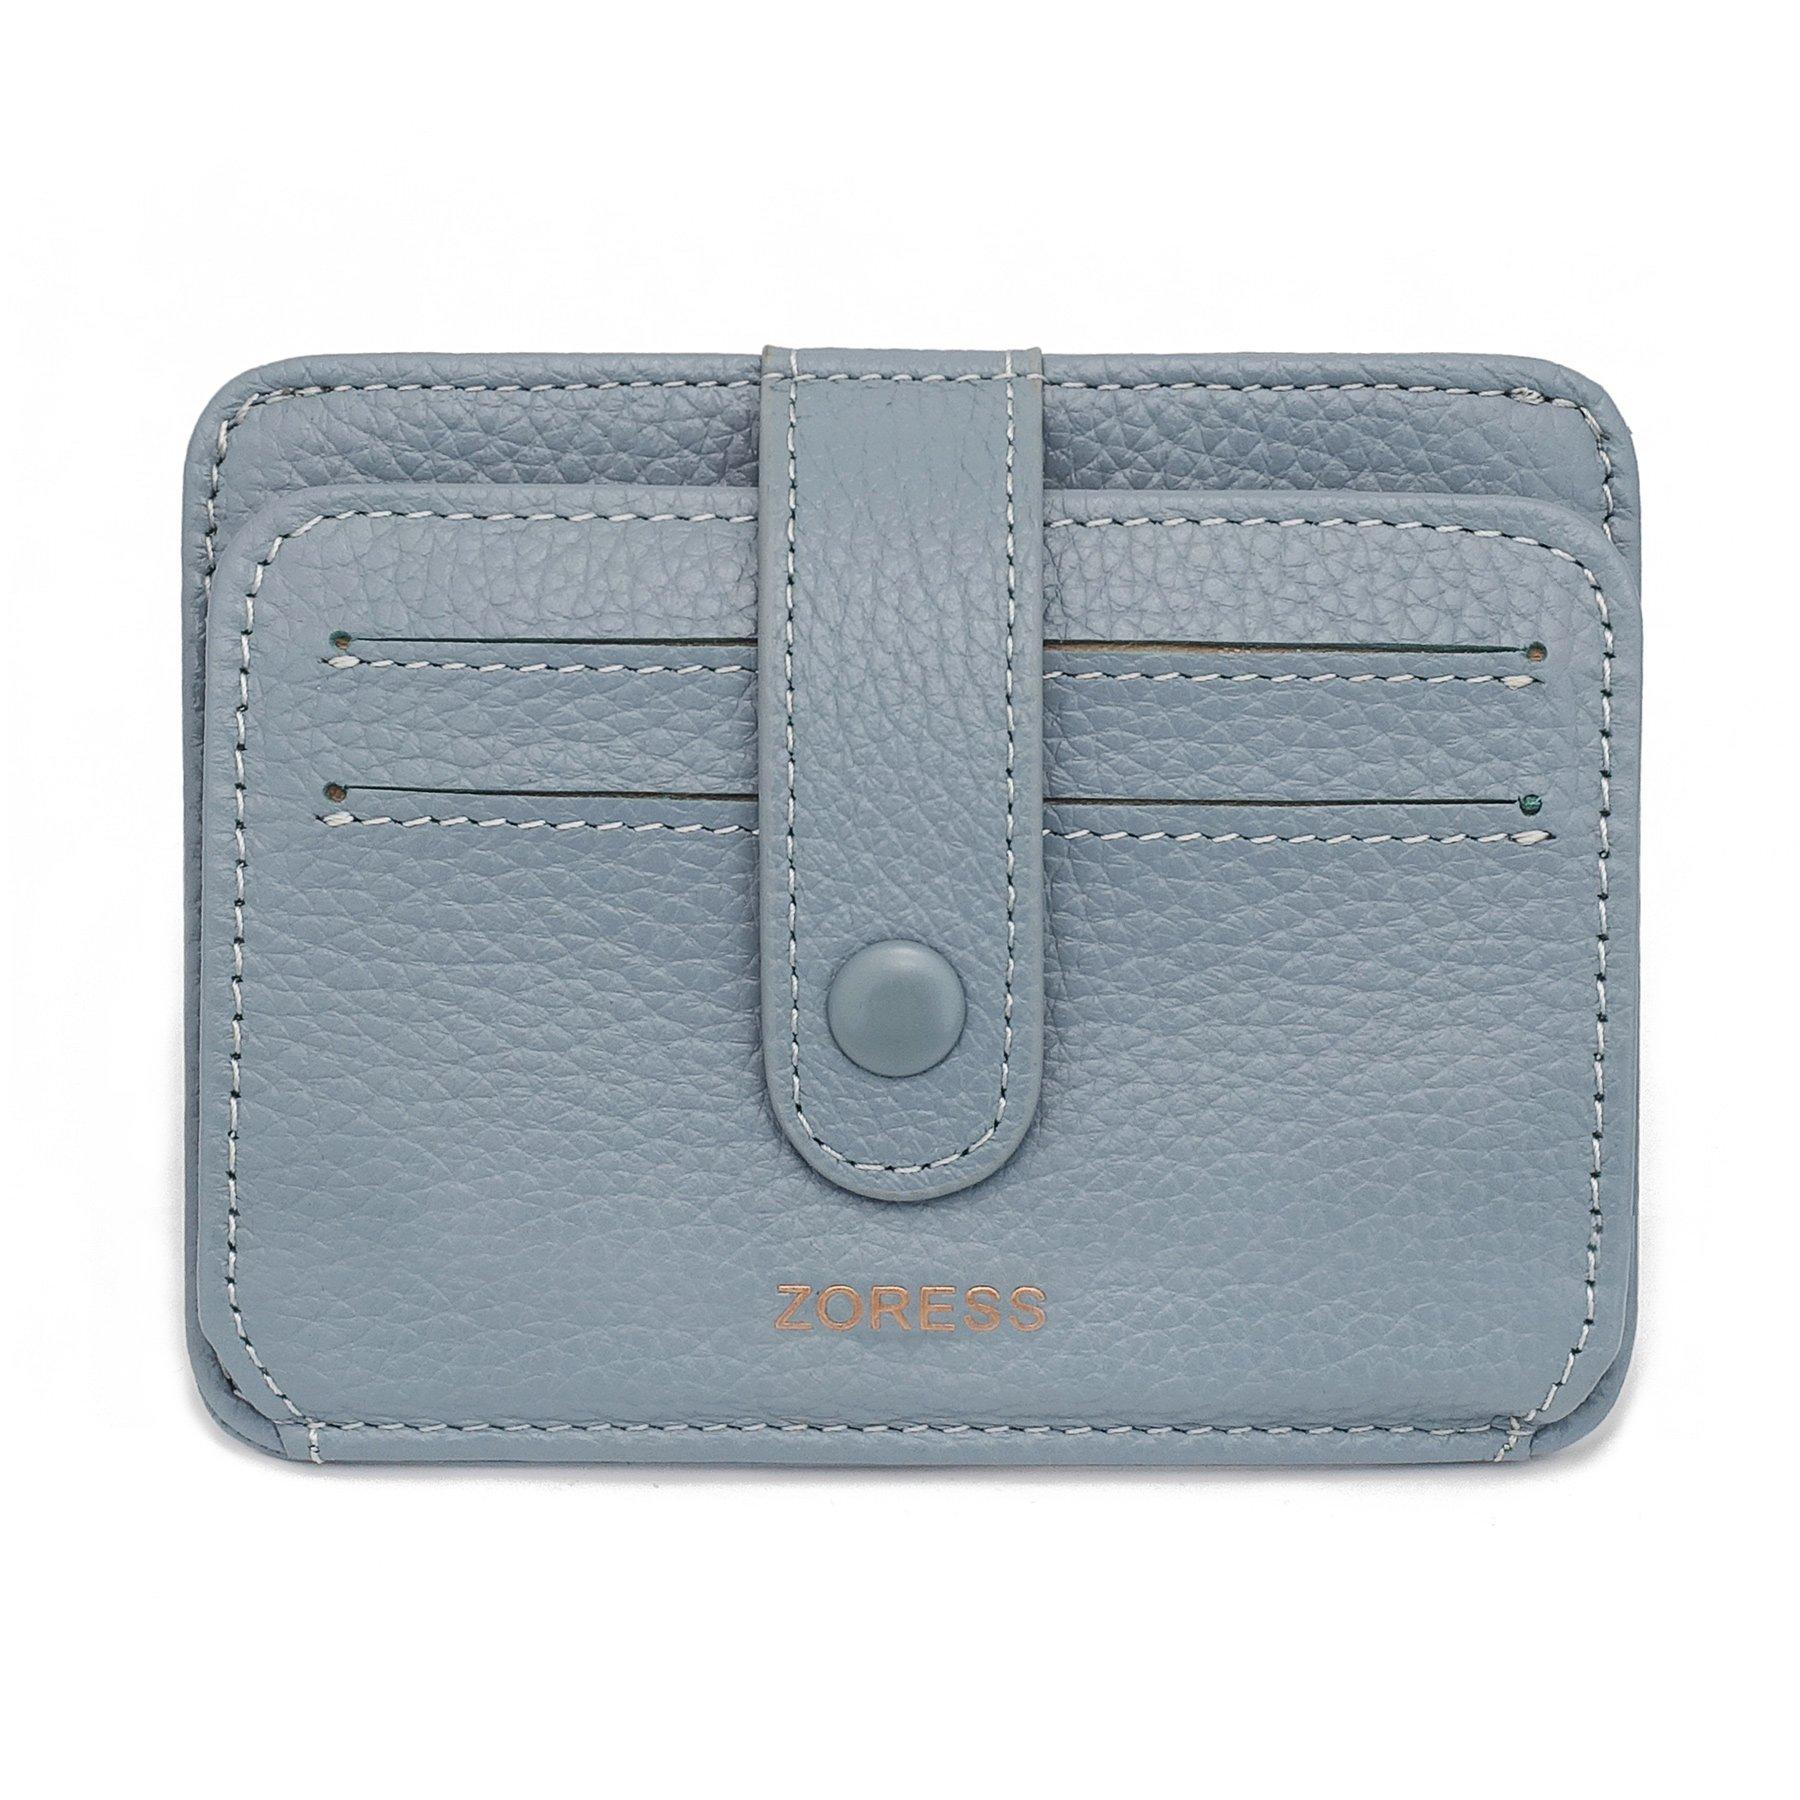 ZORESS Womens Leather RFID Blocking Slim Credit Card Case Holder Travel Front Pocket Wallet(Blue)